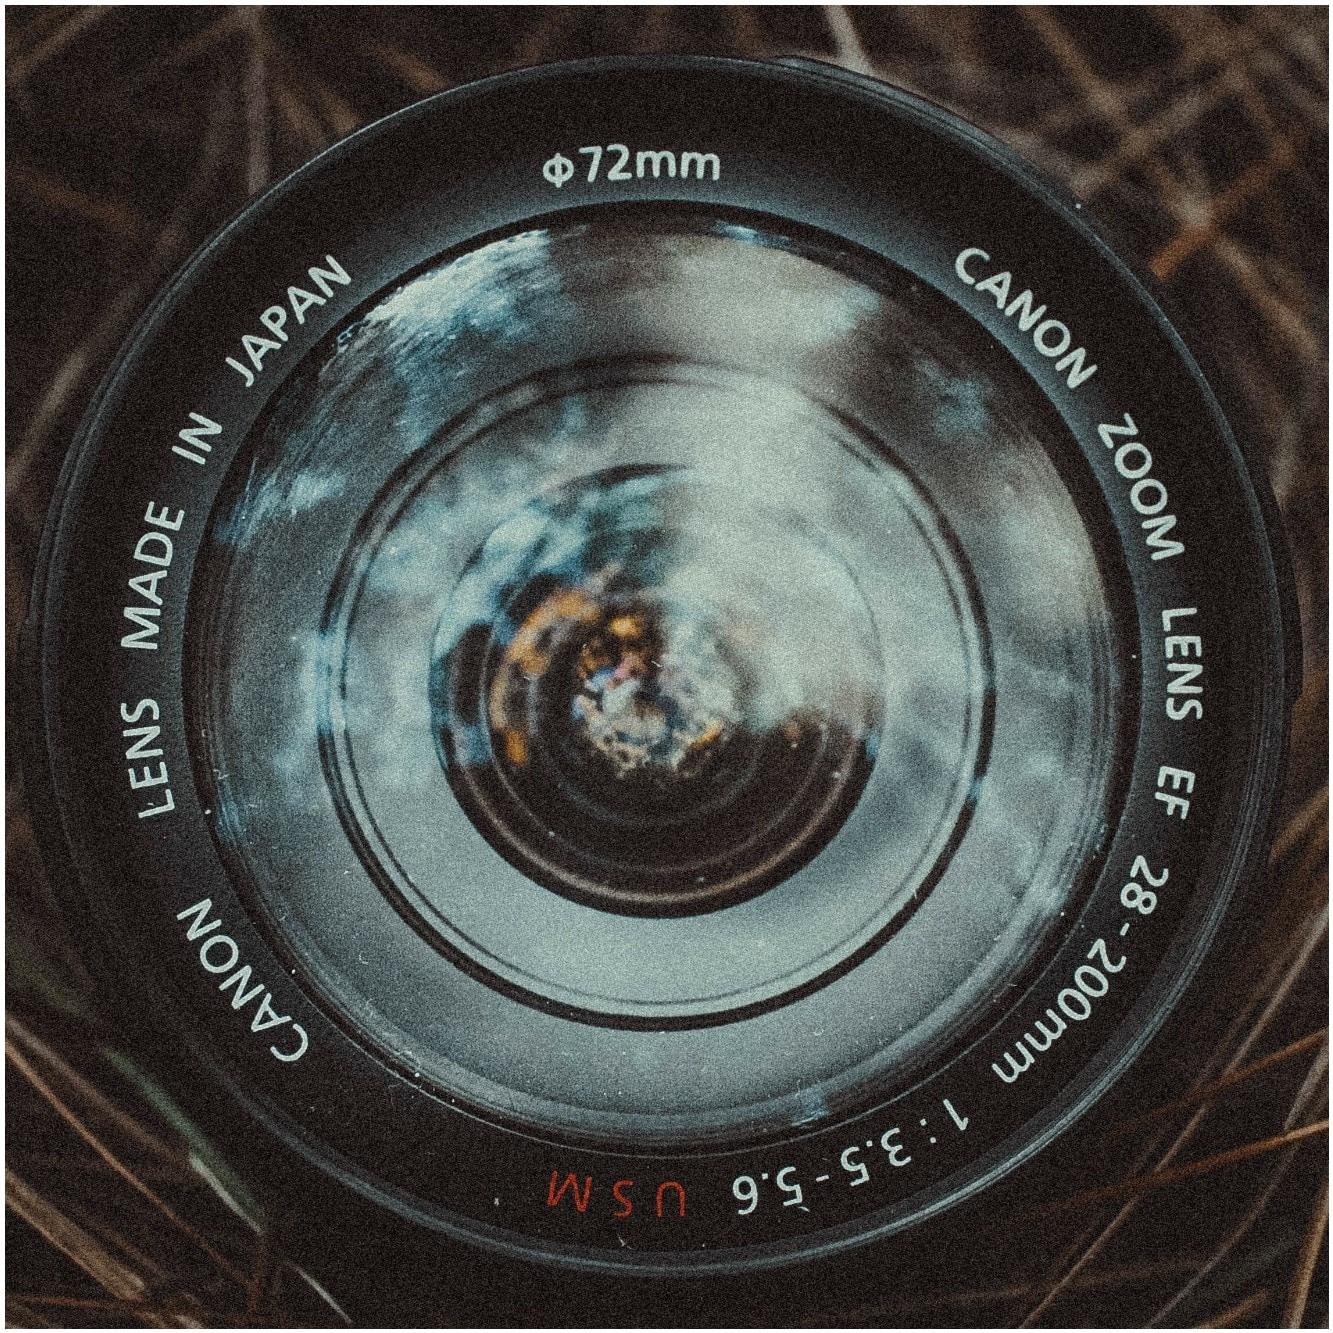 Go to Fotolehrling's profile